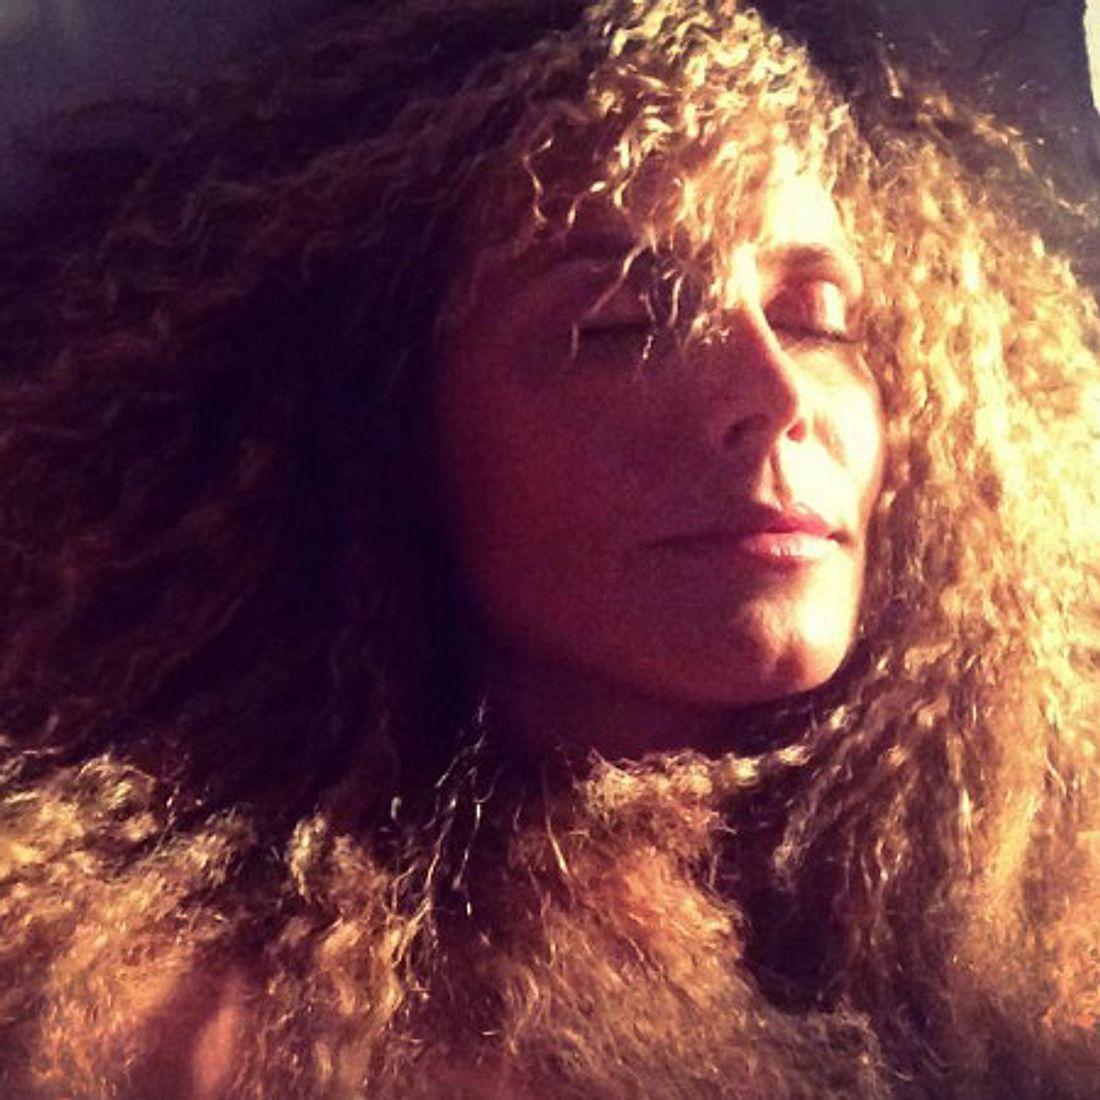 Heidi Klum mit Pudel-Locken